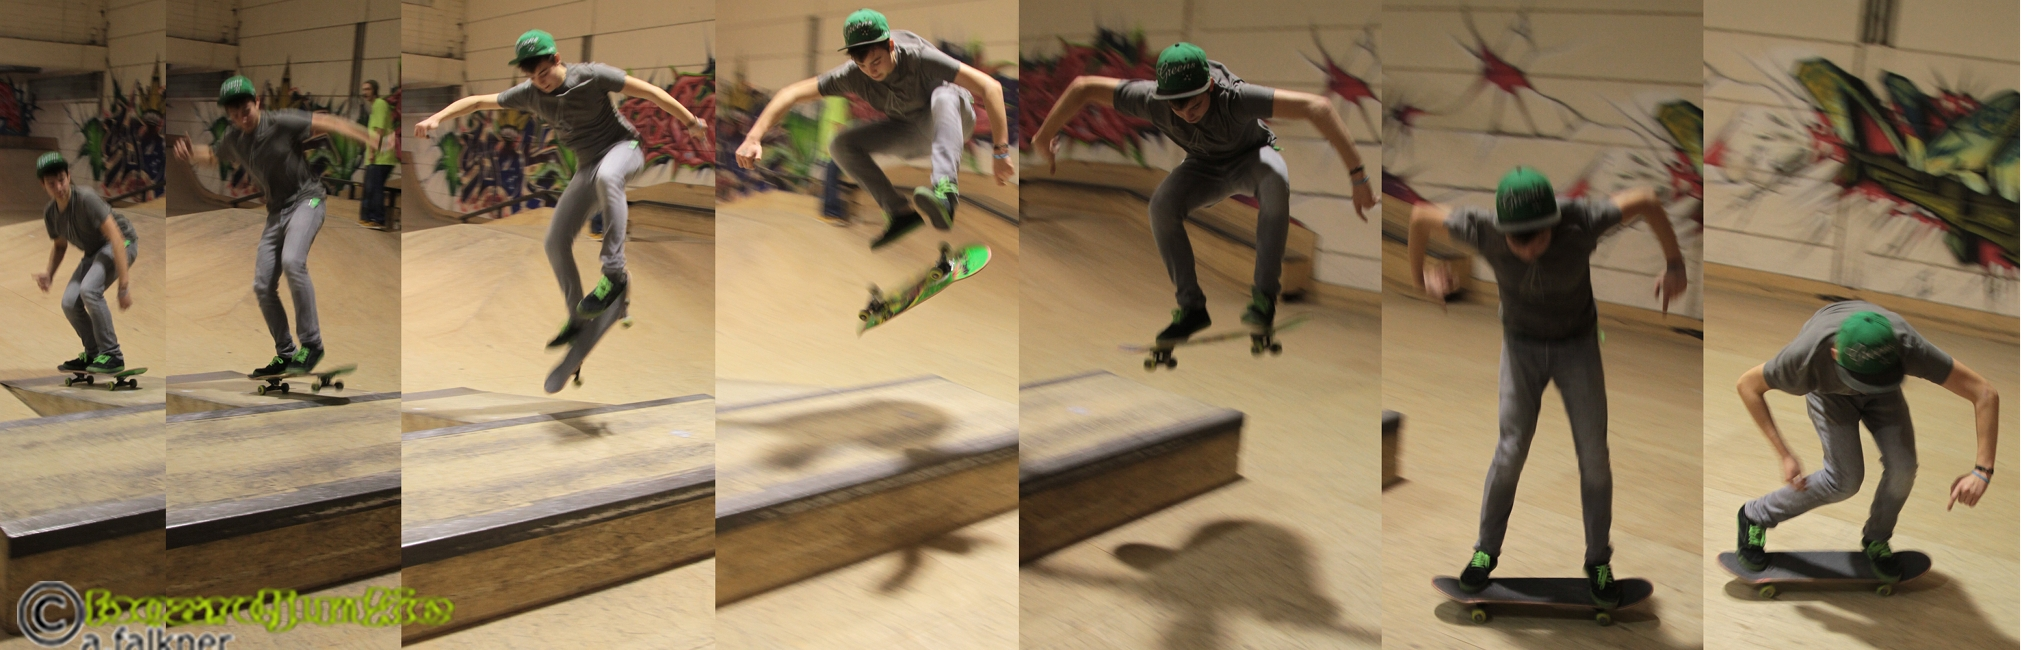 Thomas boardjunkie - heelflip über kicker